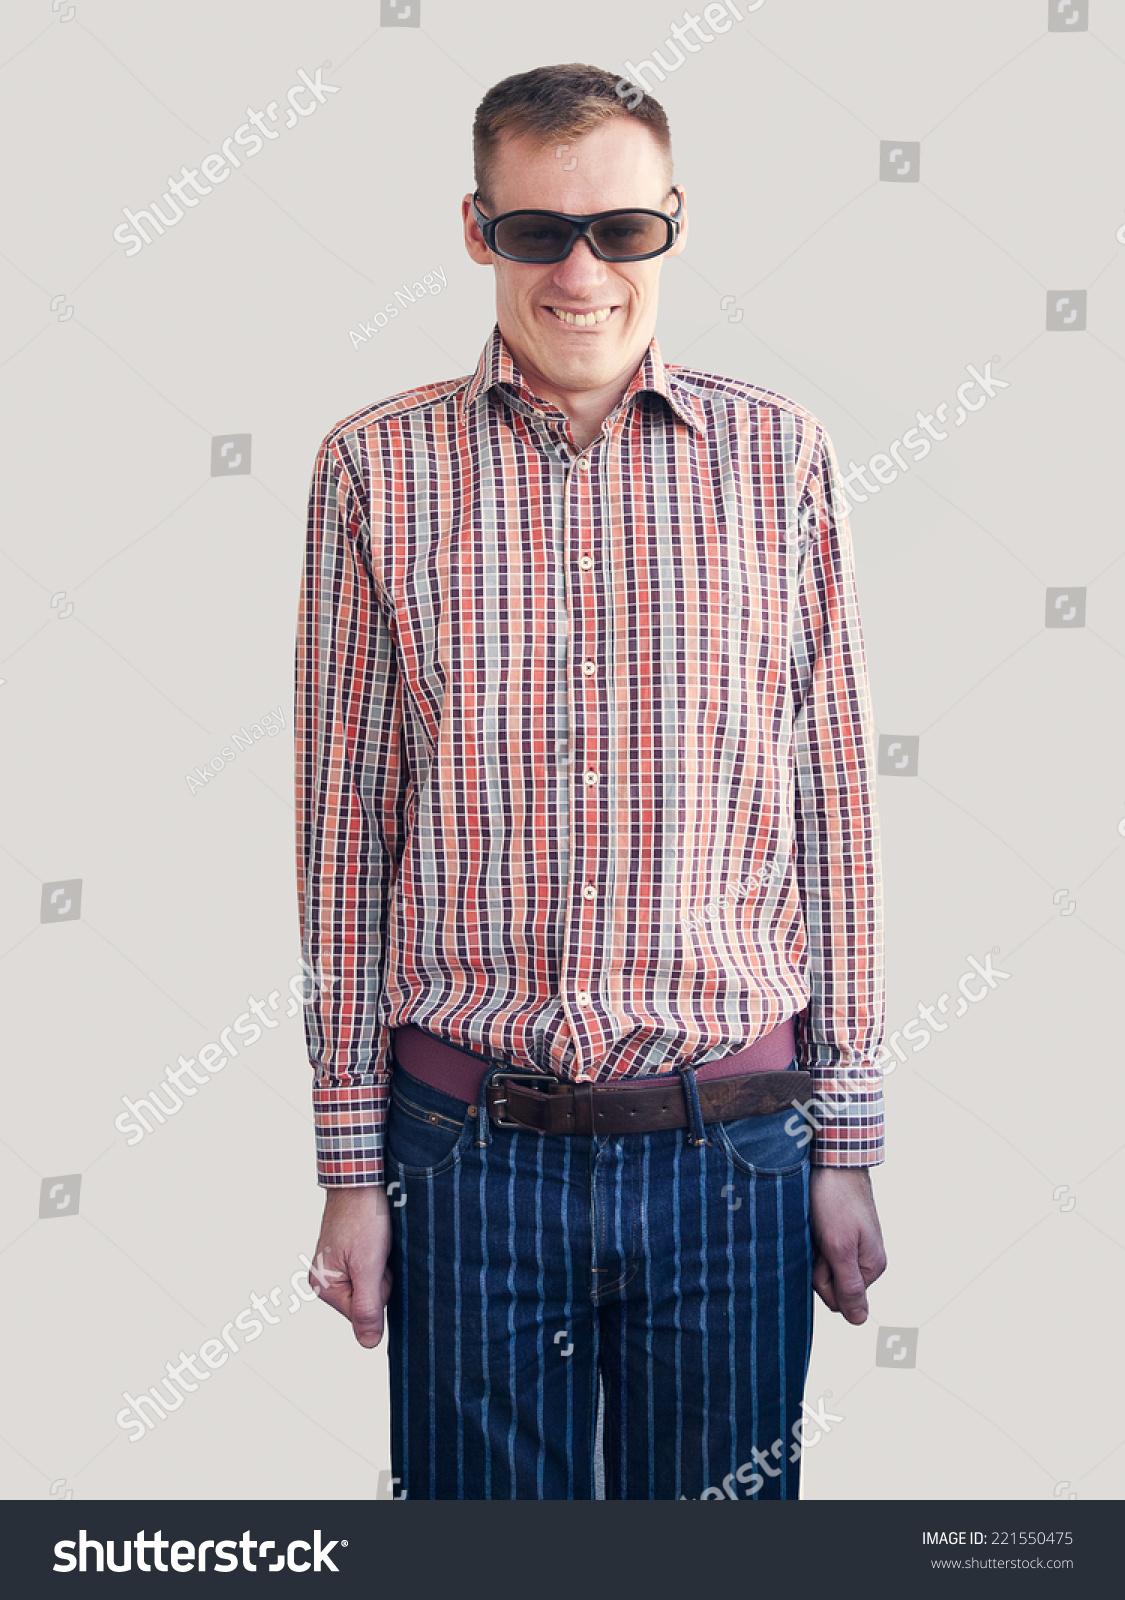 Antistyle Nerd Man Plaid Shirt Striped Stock Photo 221550475 ...